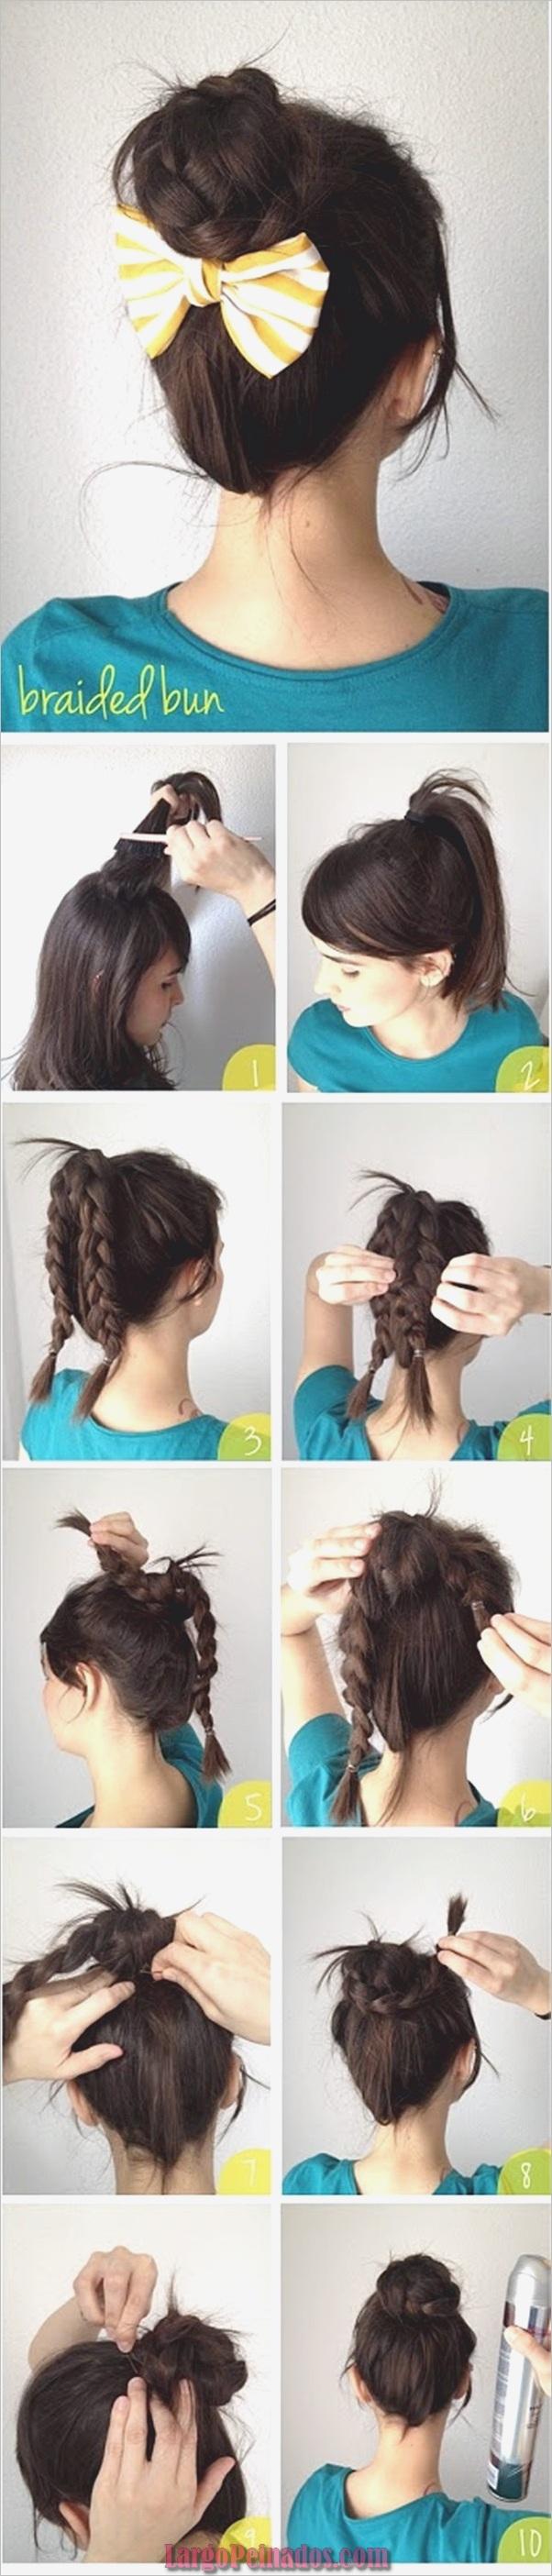 Peinados simples de cinco minutos (16)